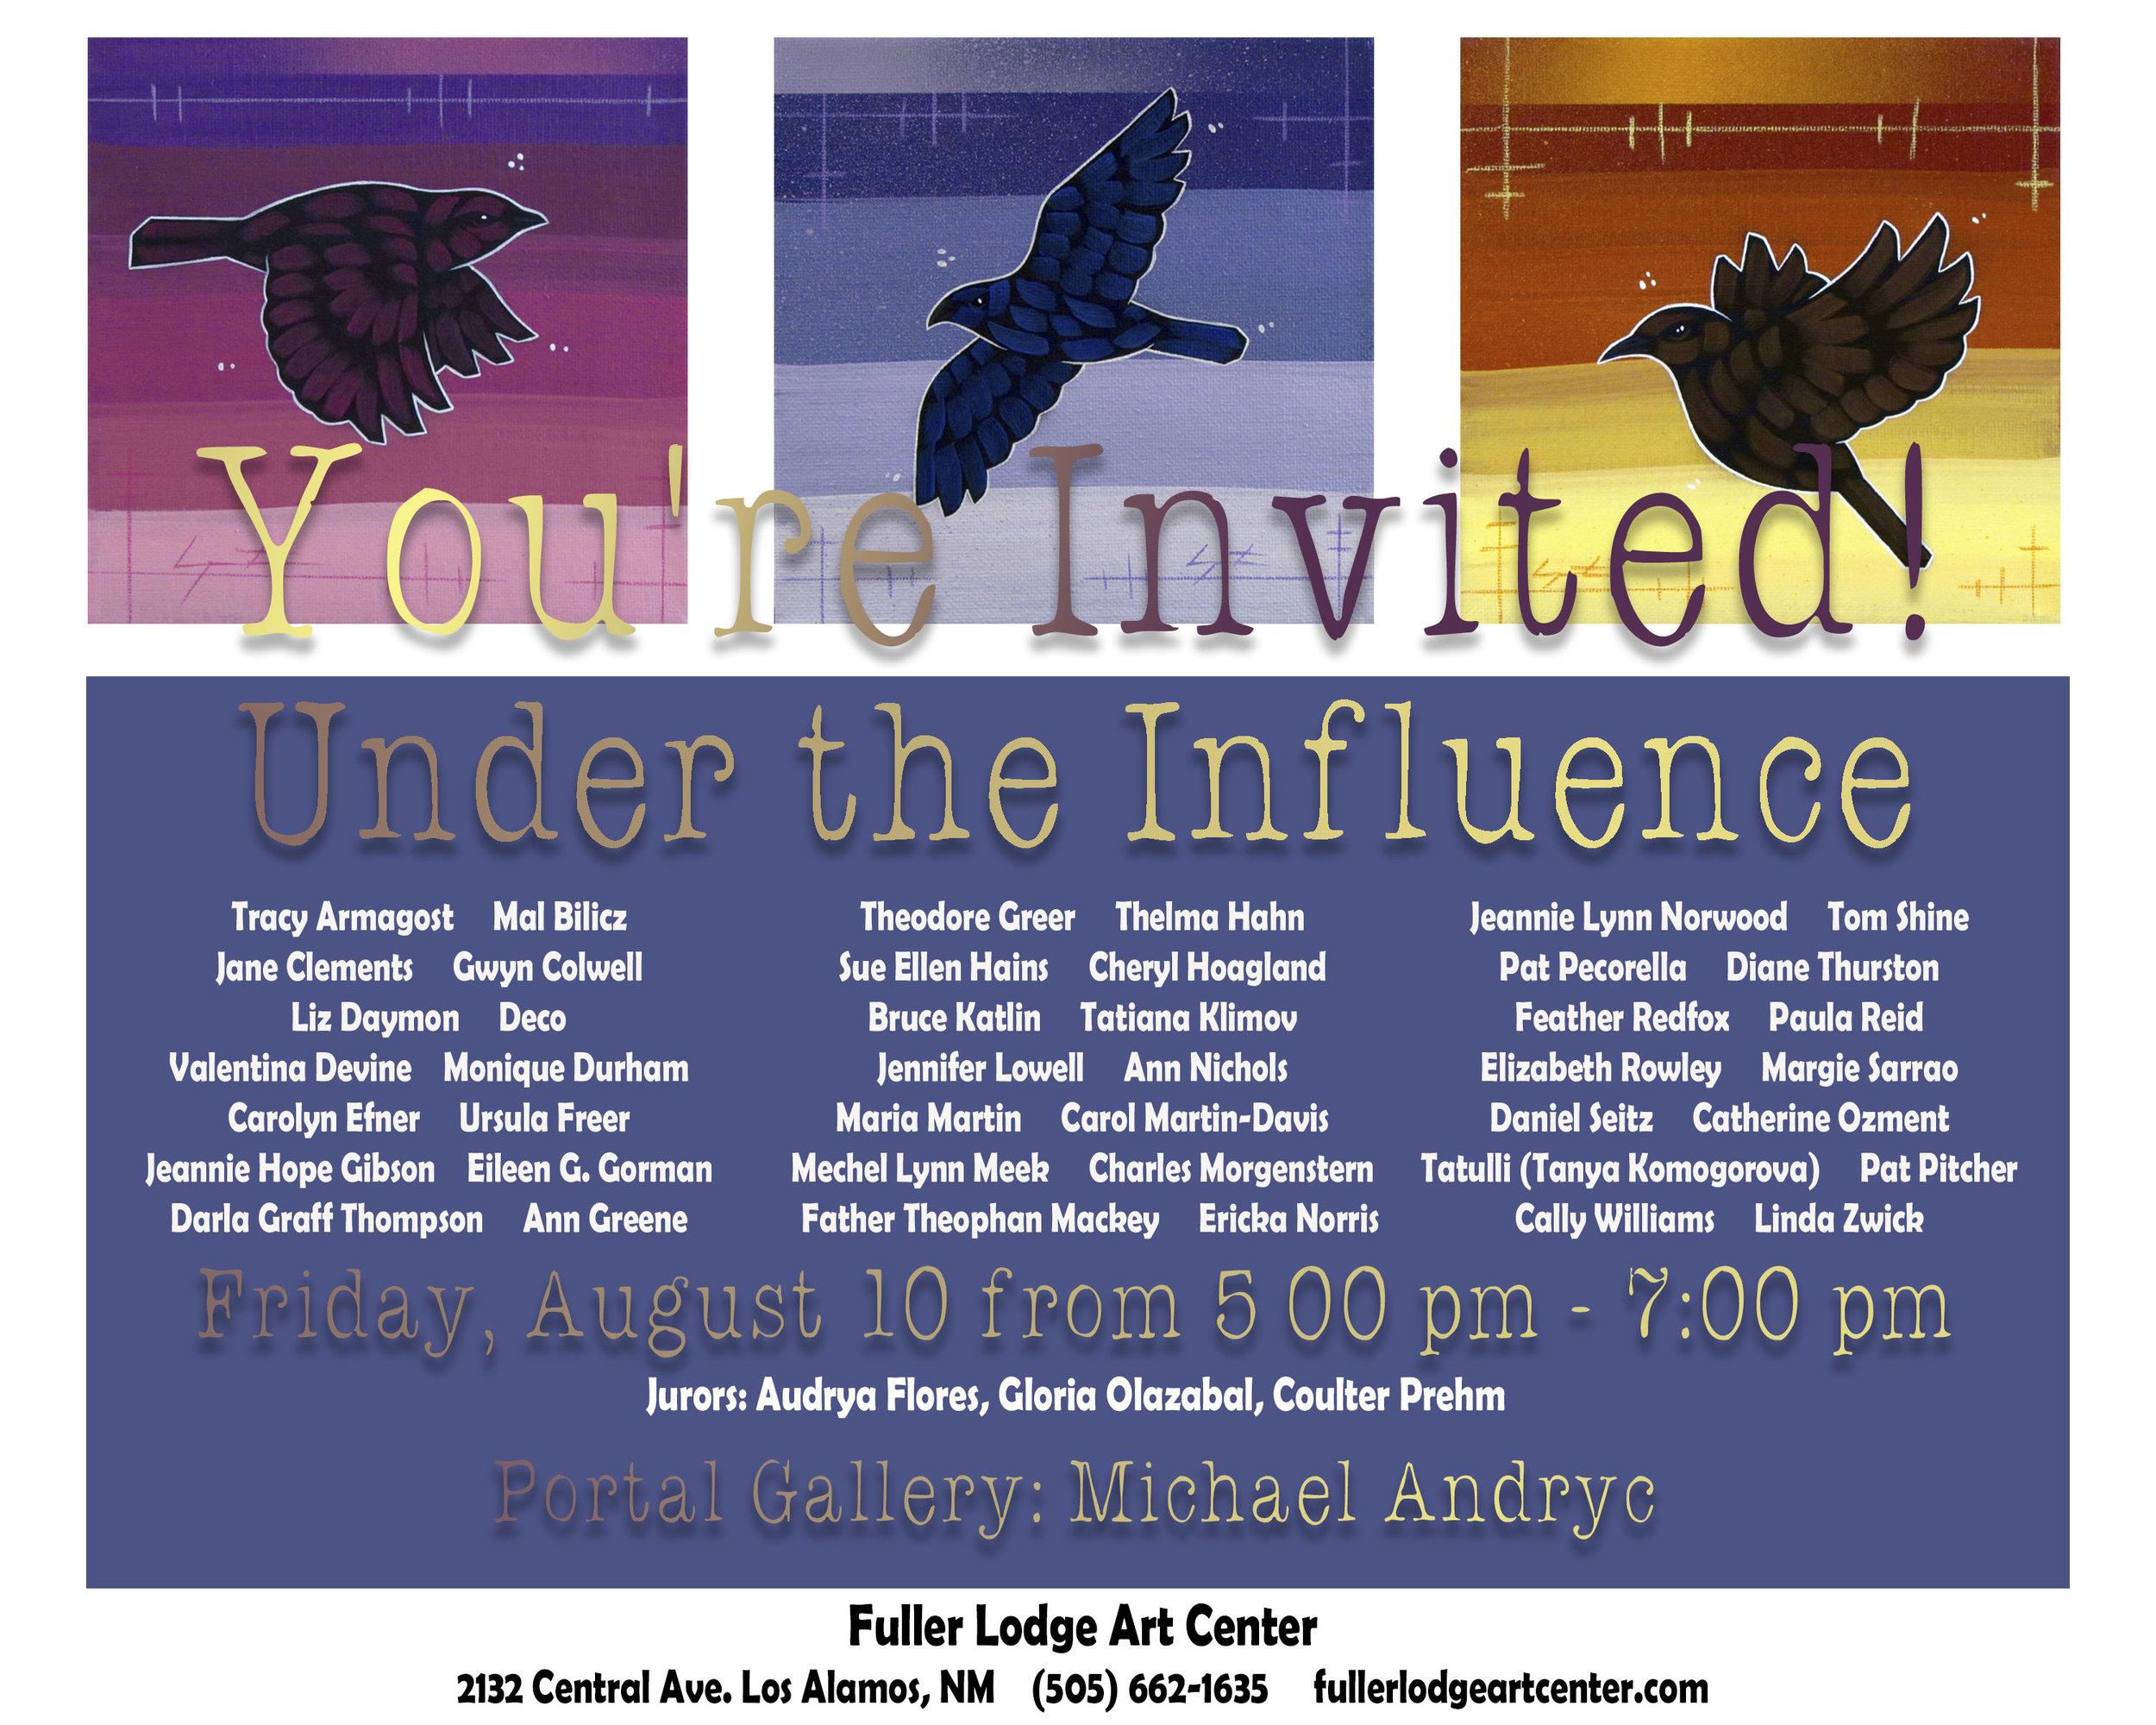 Under the Influence Invitation.jpg